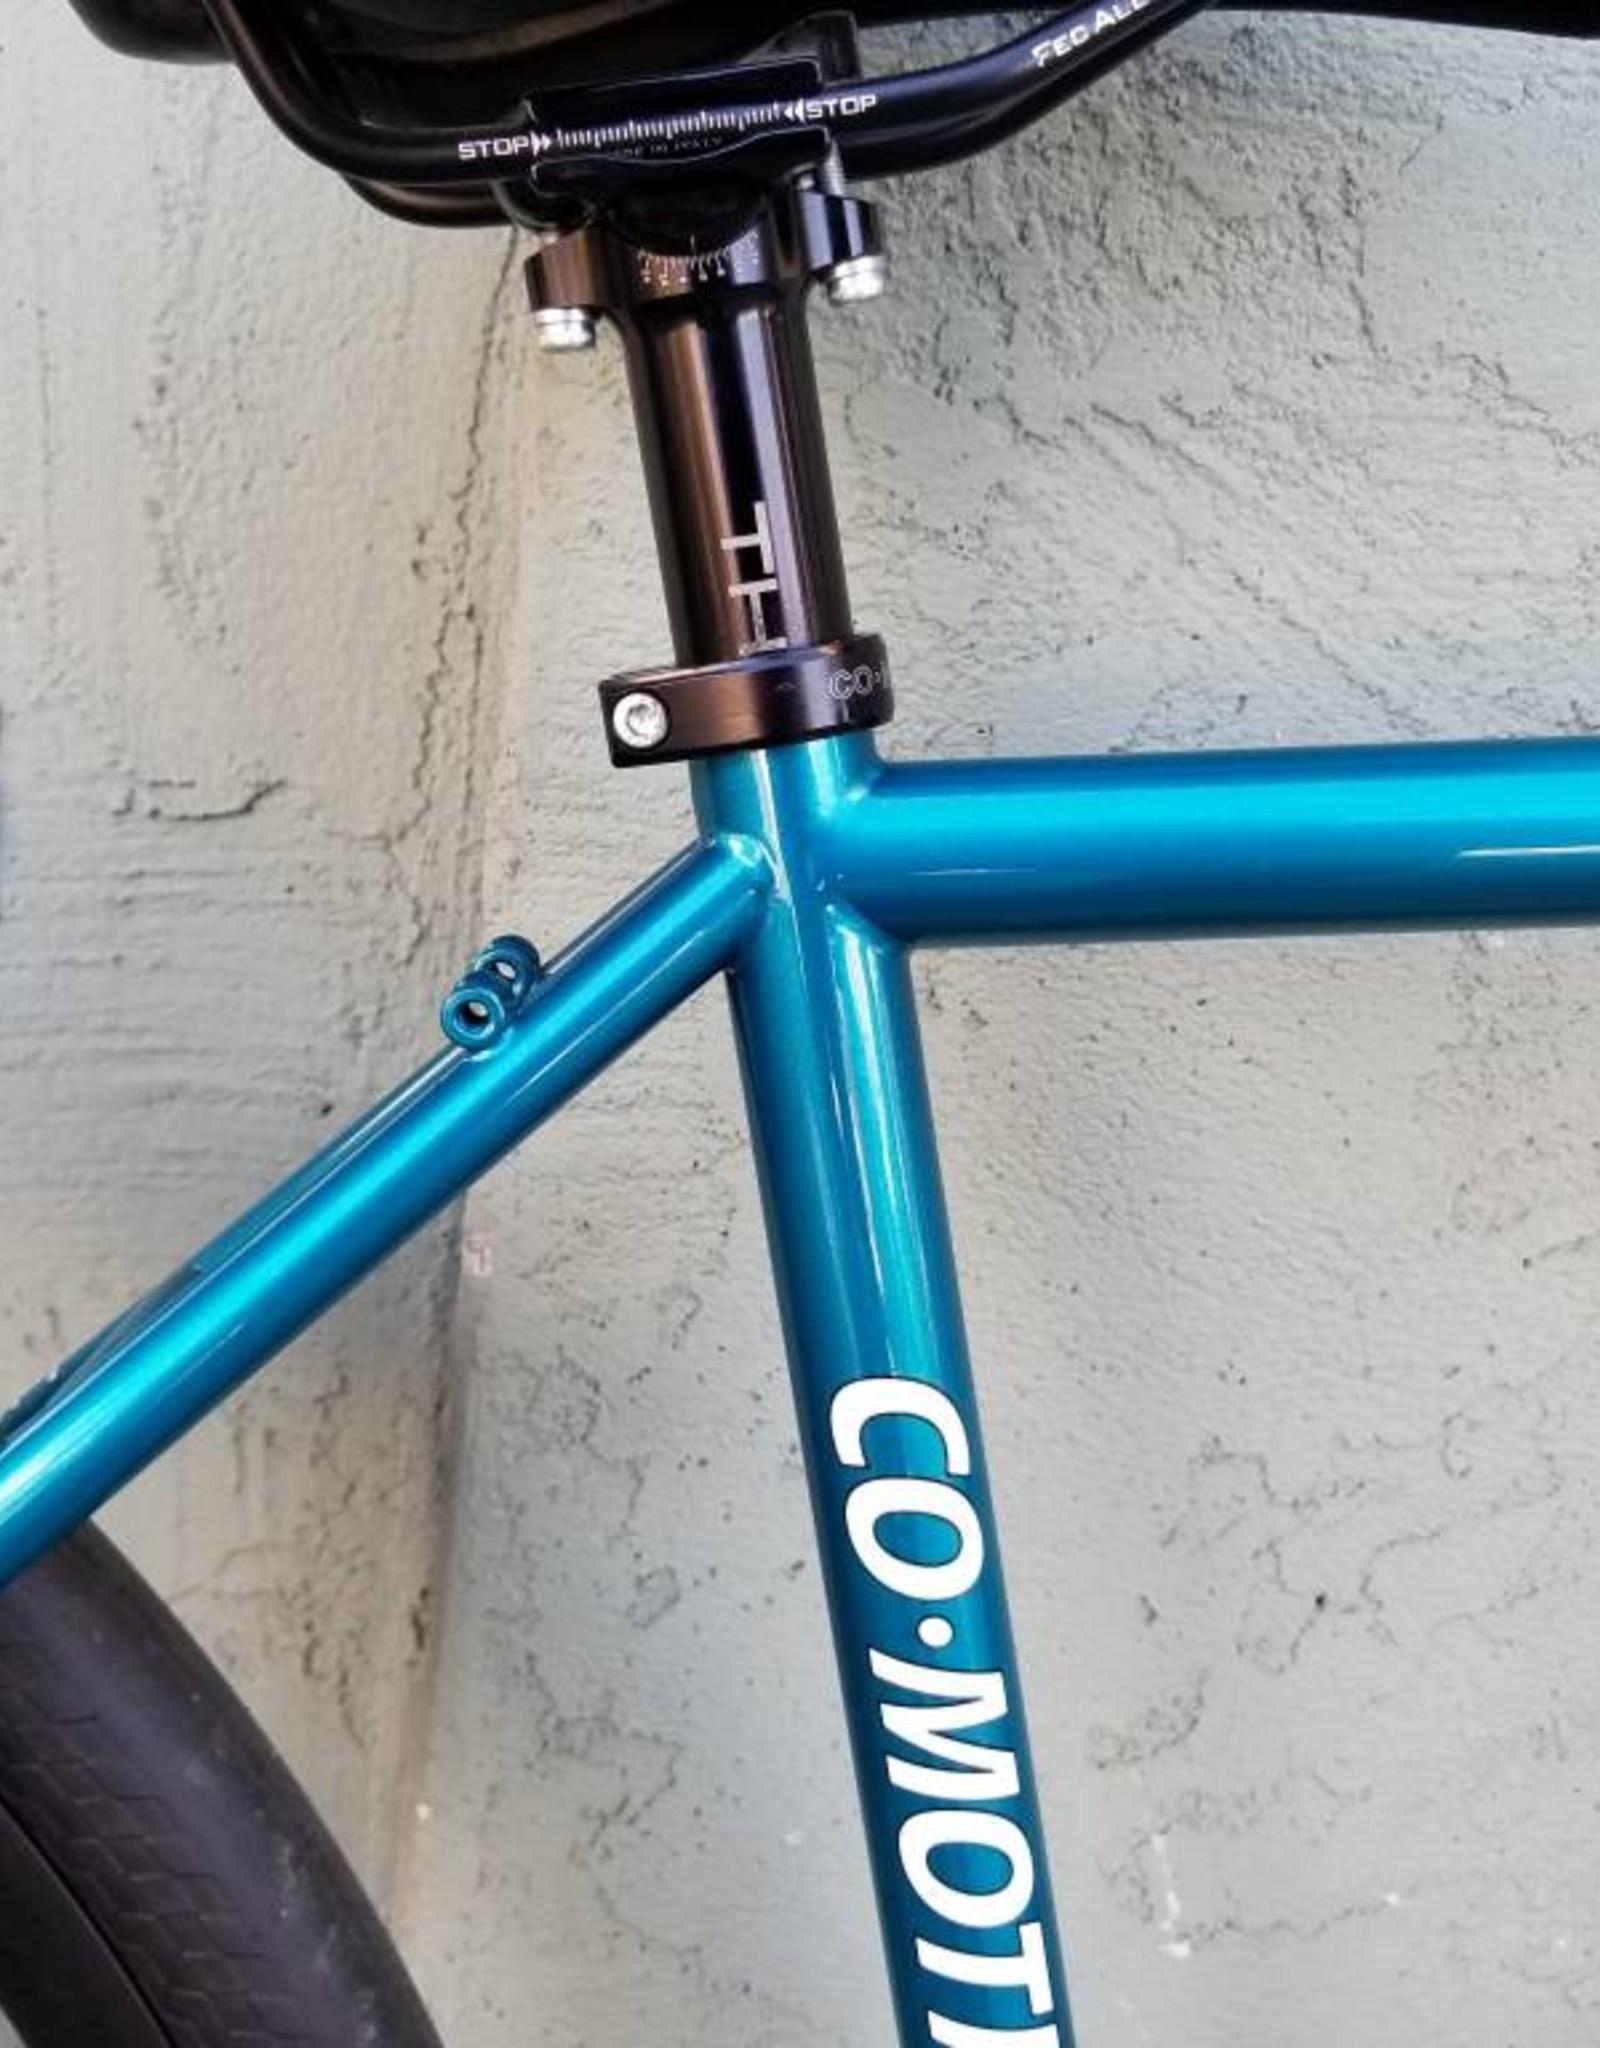 Co-Motion Cycles Co-Motion Ochoco 50cm